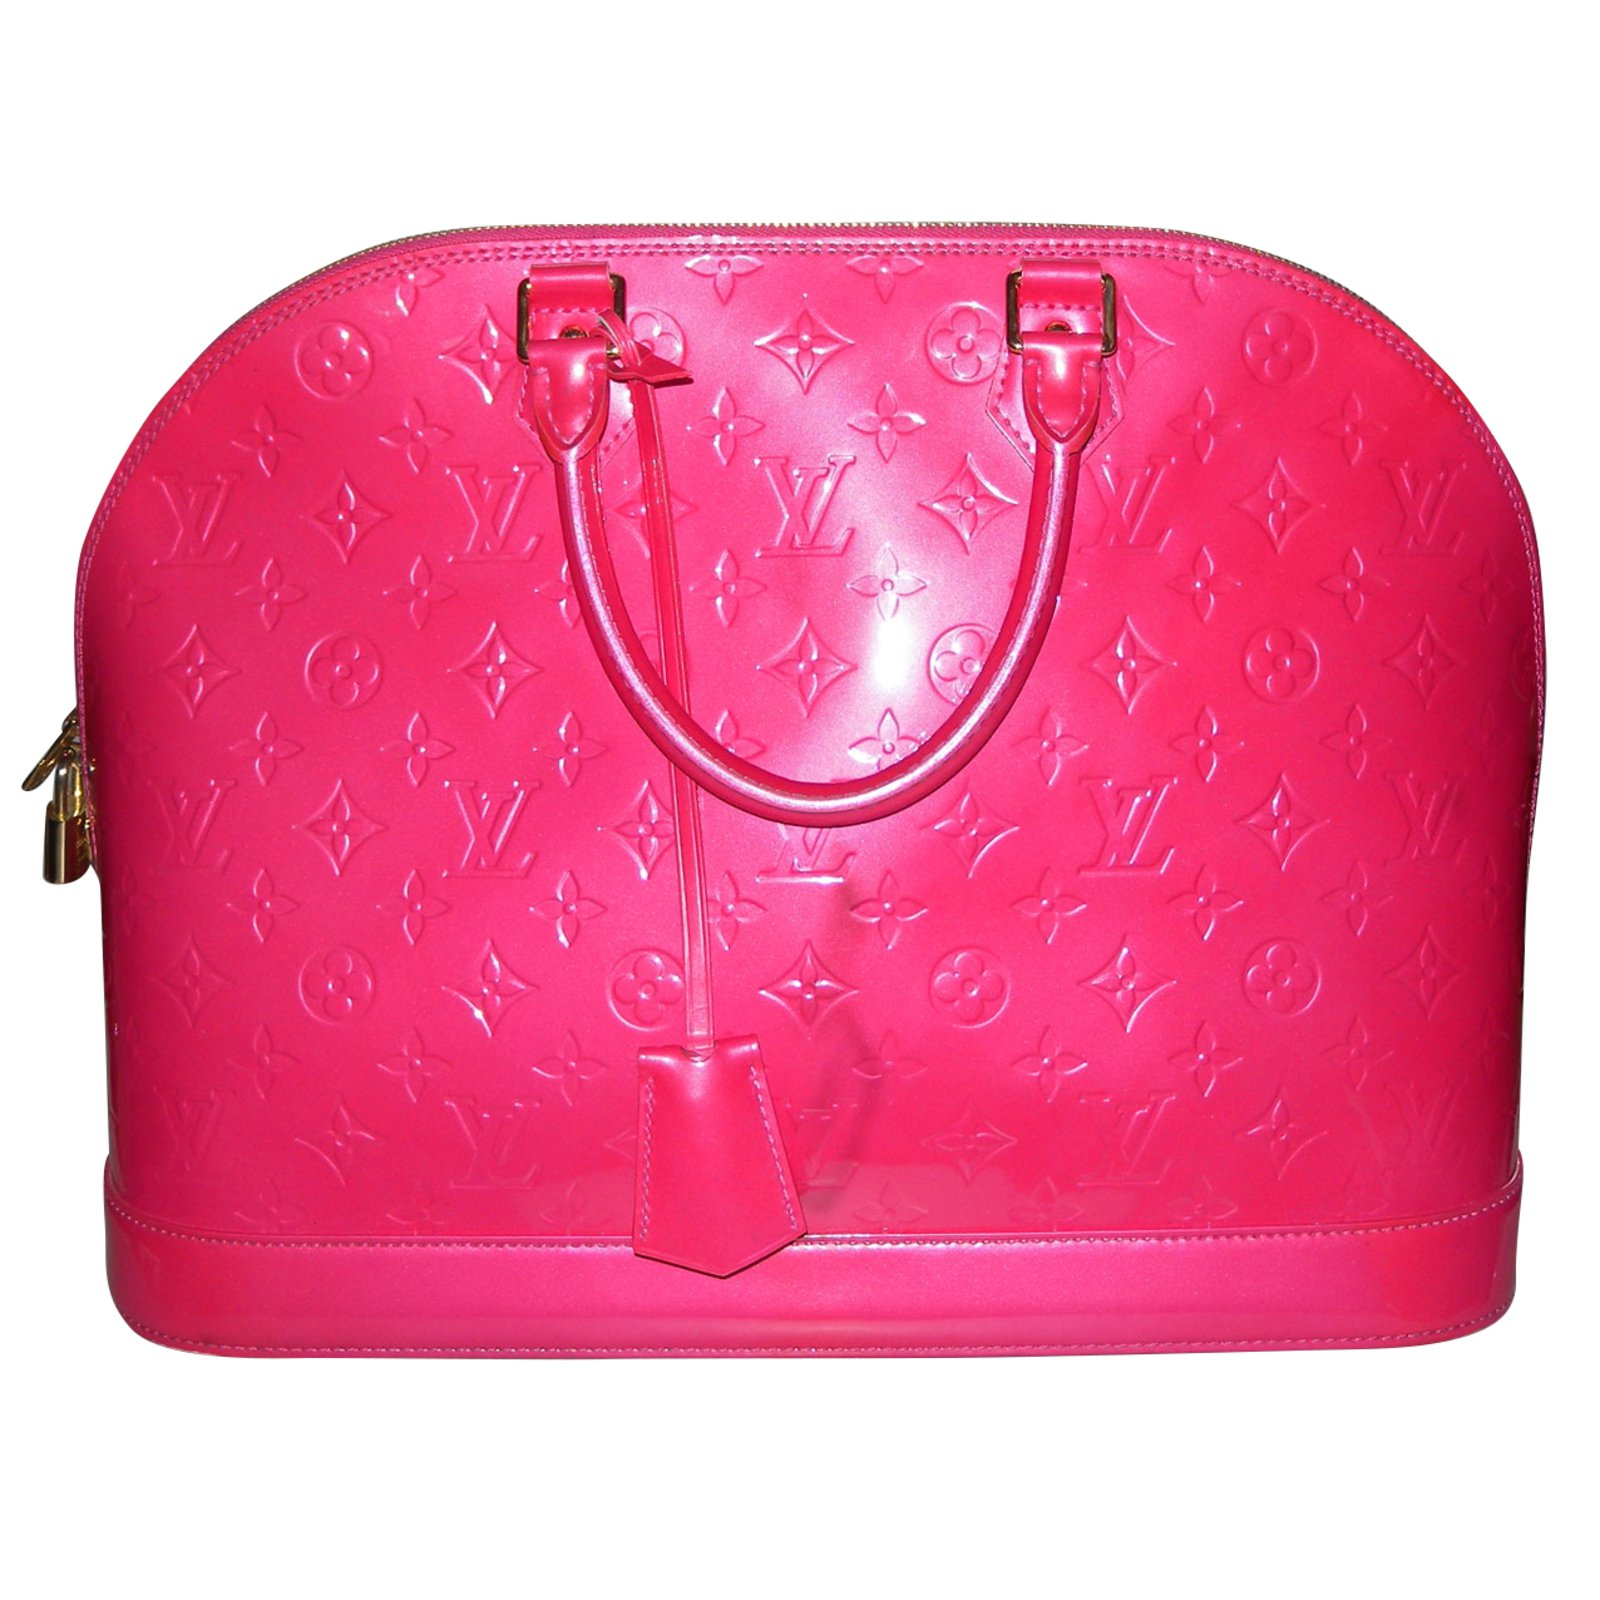 0728aae68a1e Louis Vuitton ALMA GM Handbags Patent leather Pink ref.62724 - Joli ...